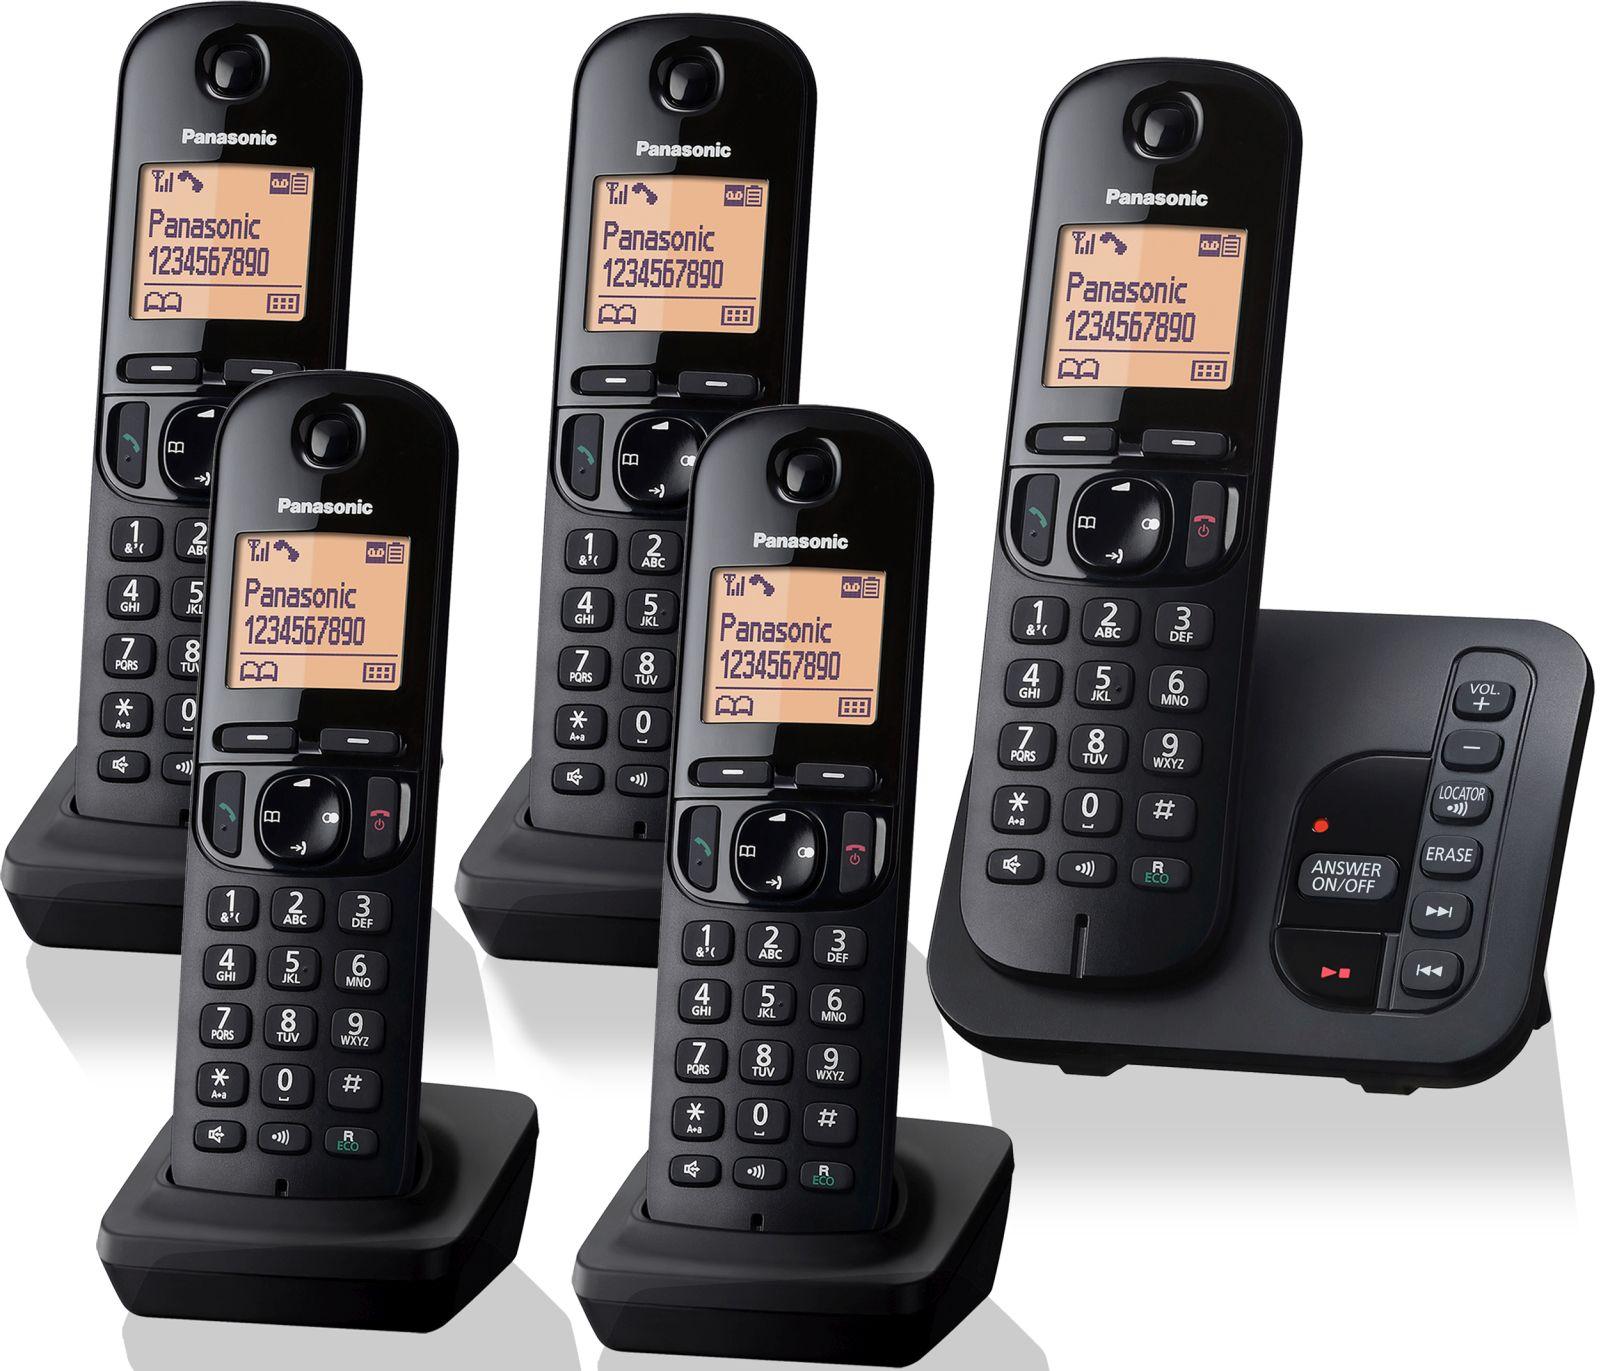 Image of Panasonic KX-TGC 225EB Cordless Phone, Five Handsets with Answer Machine